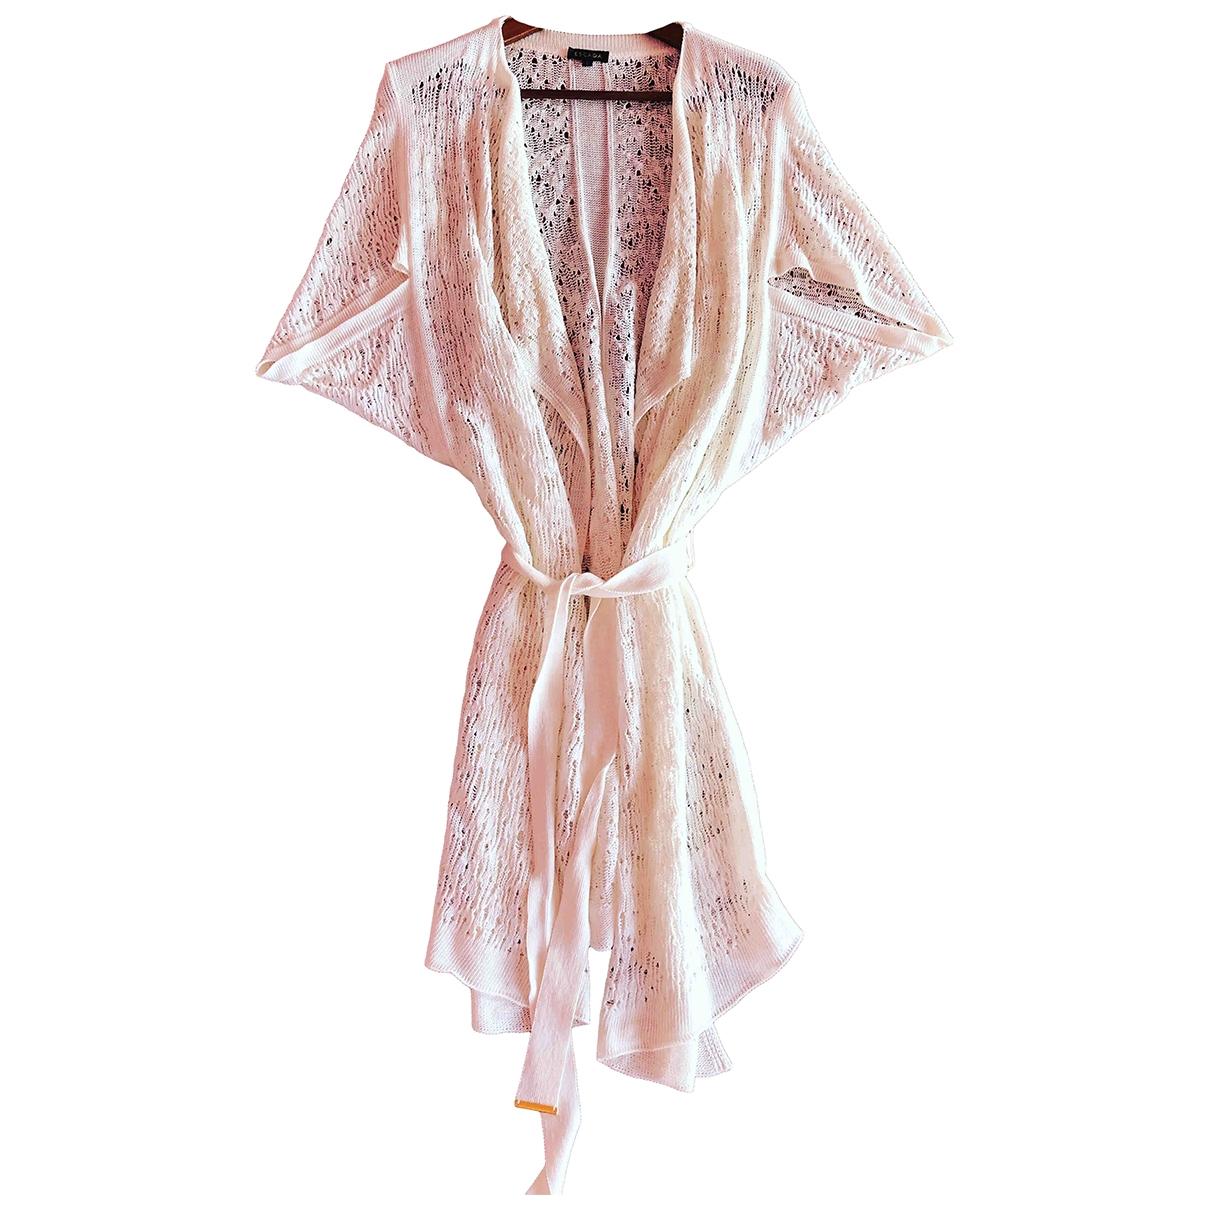 Escada \N Kleid in  Weiss Polyester